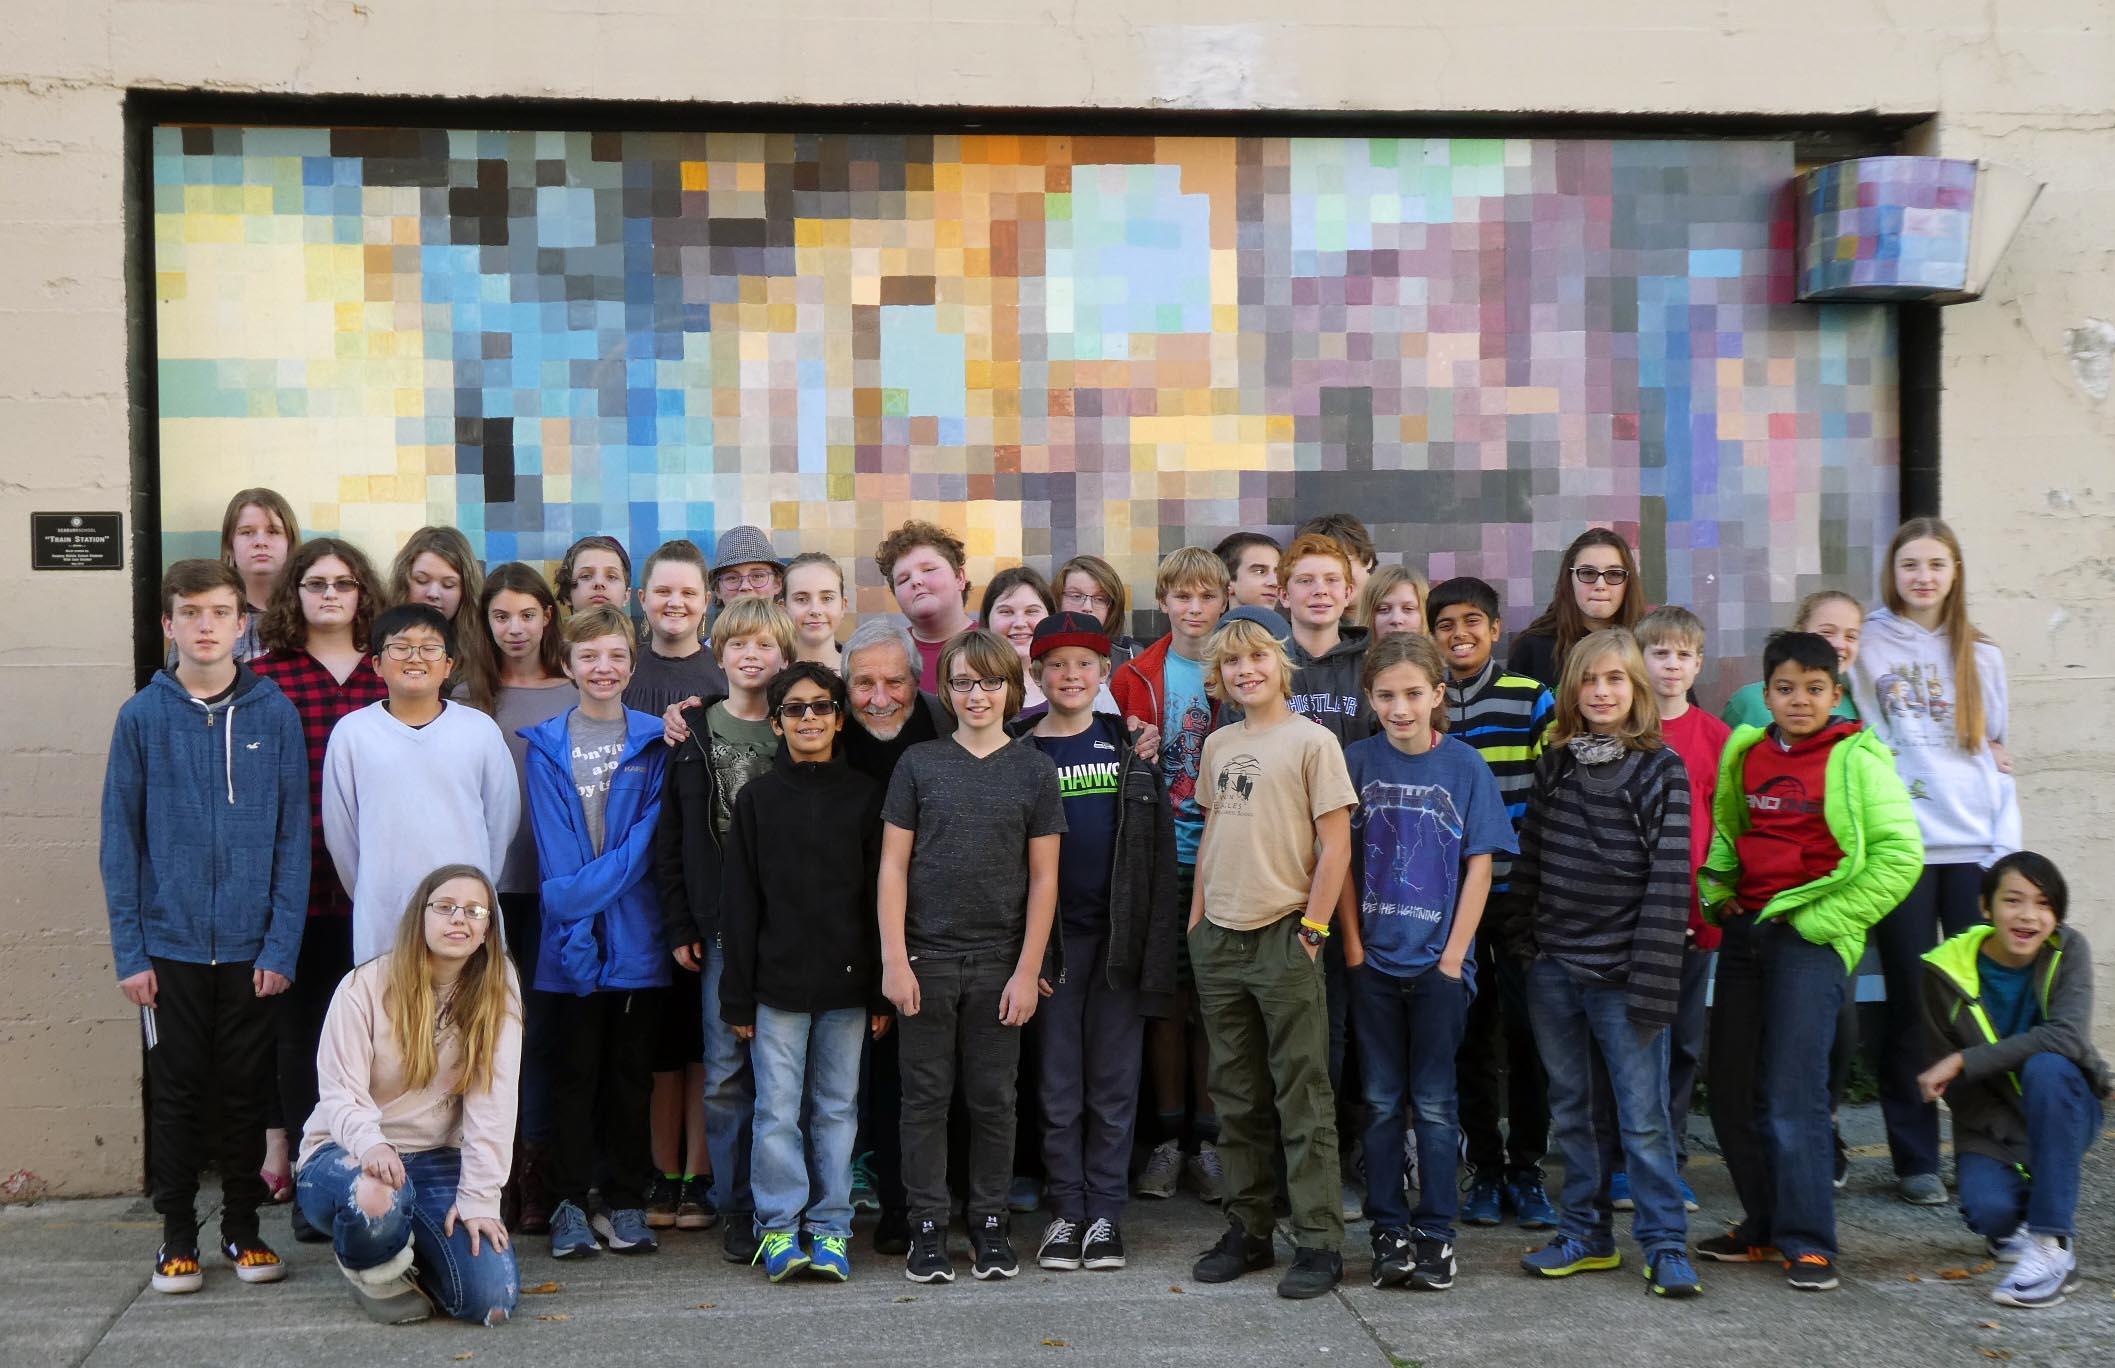 Seabury Middle School, Tacoma, WA – October 16, 2017 (PM